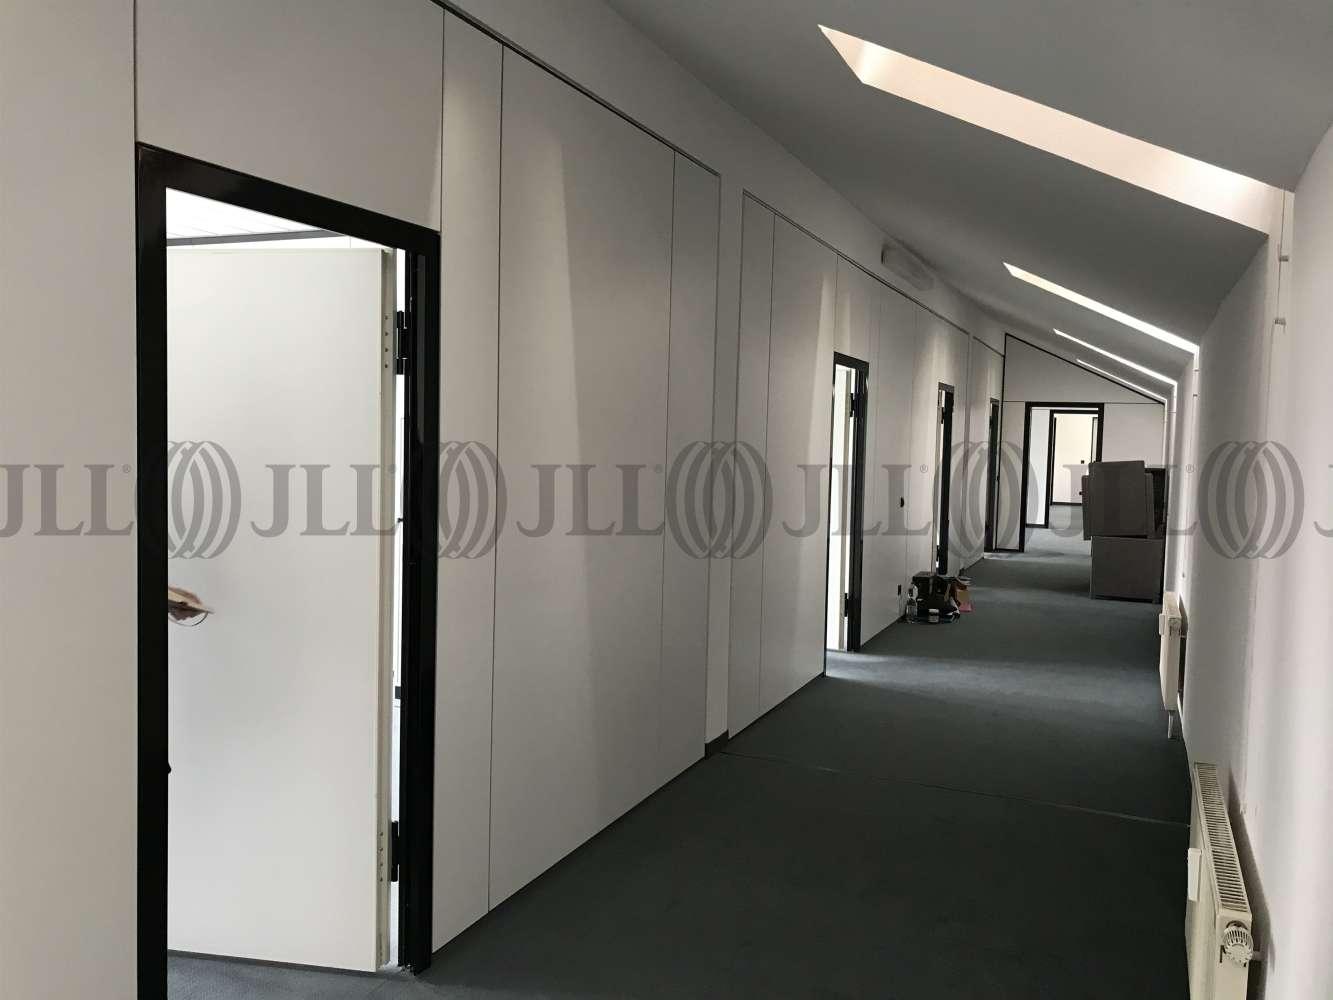 Büros Leinfelden-echterdingen, 70771 - Büro - Leinfelden-Echterdingen, Echterdingen - S0005 - 10909935